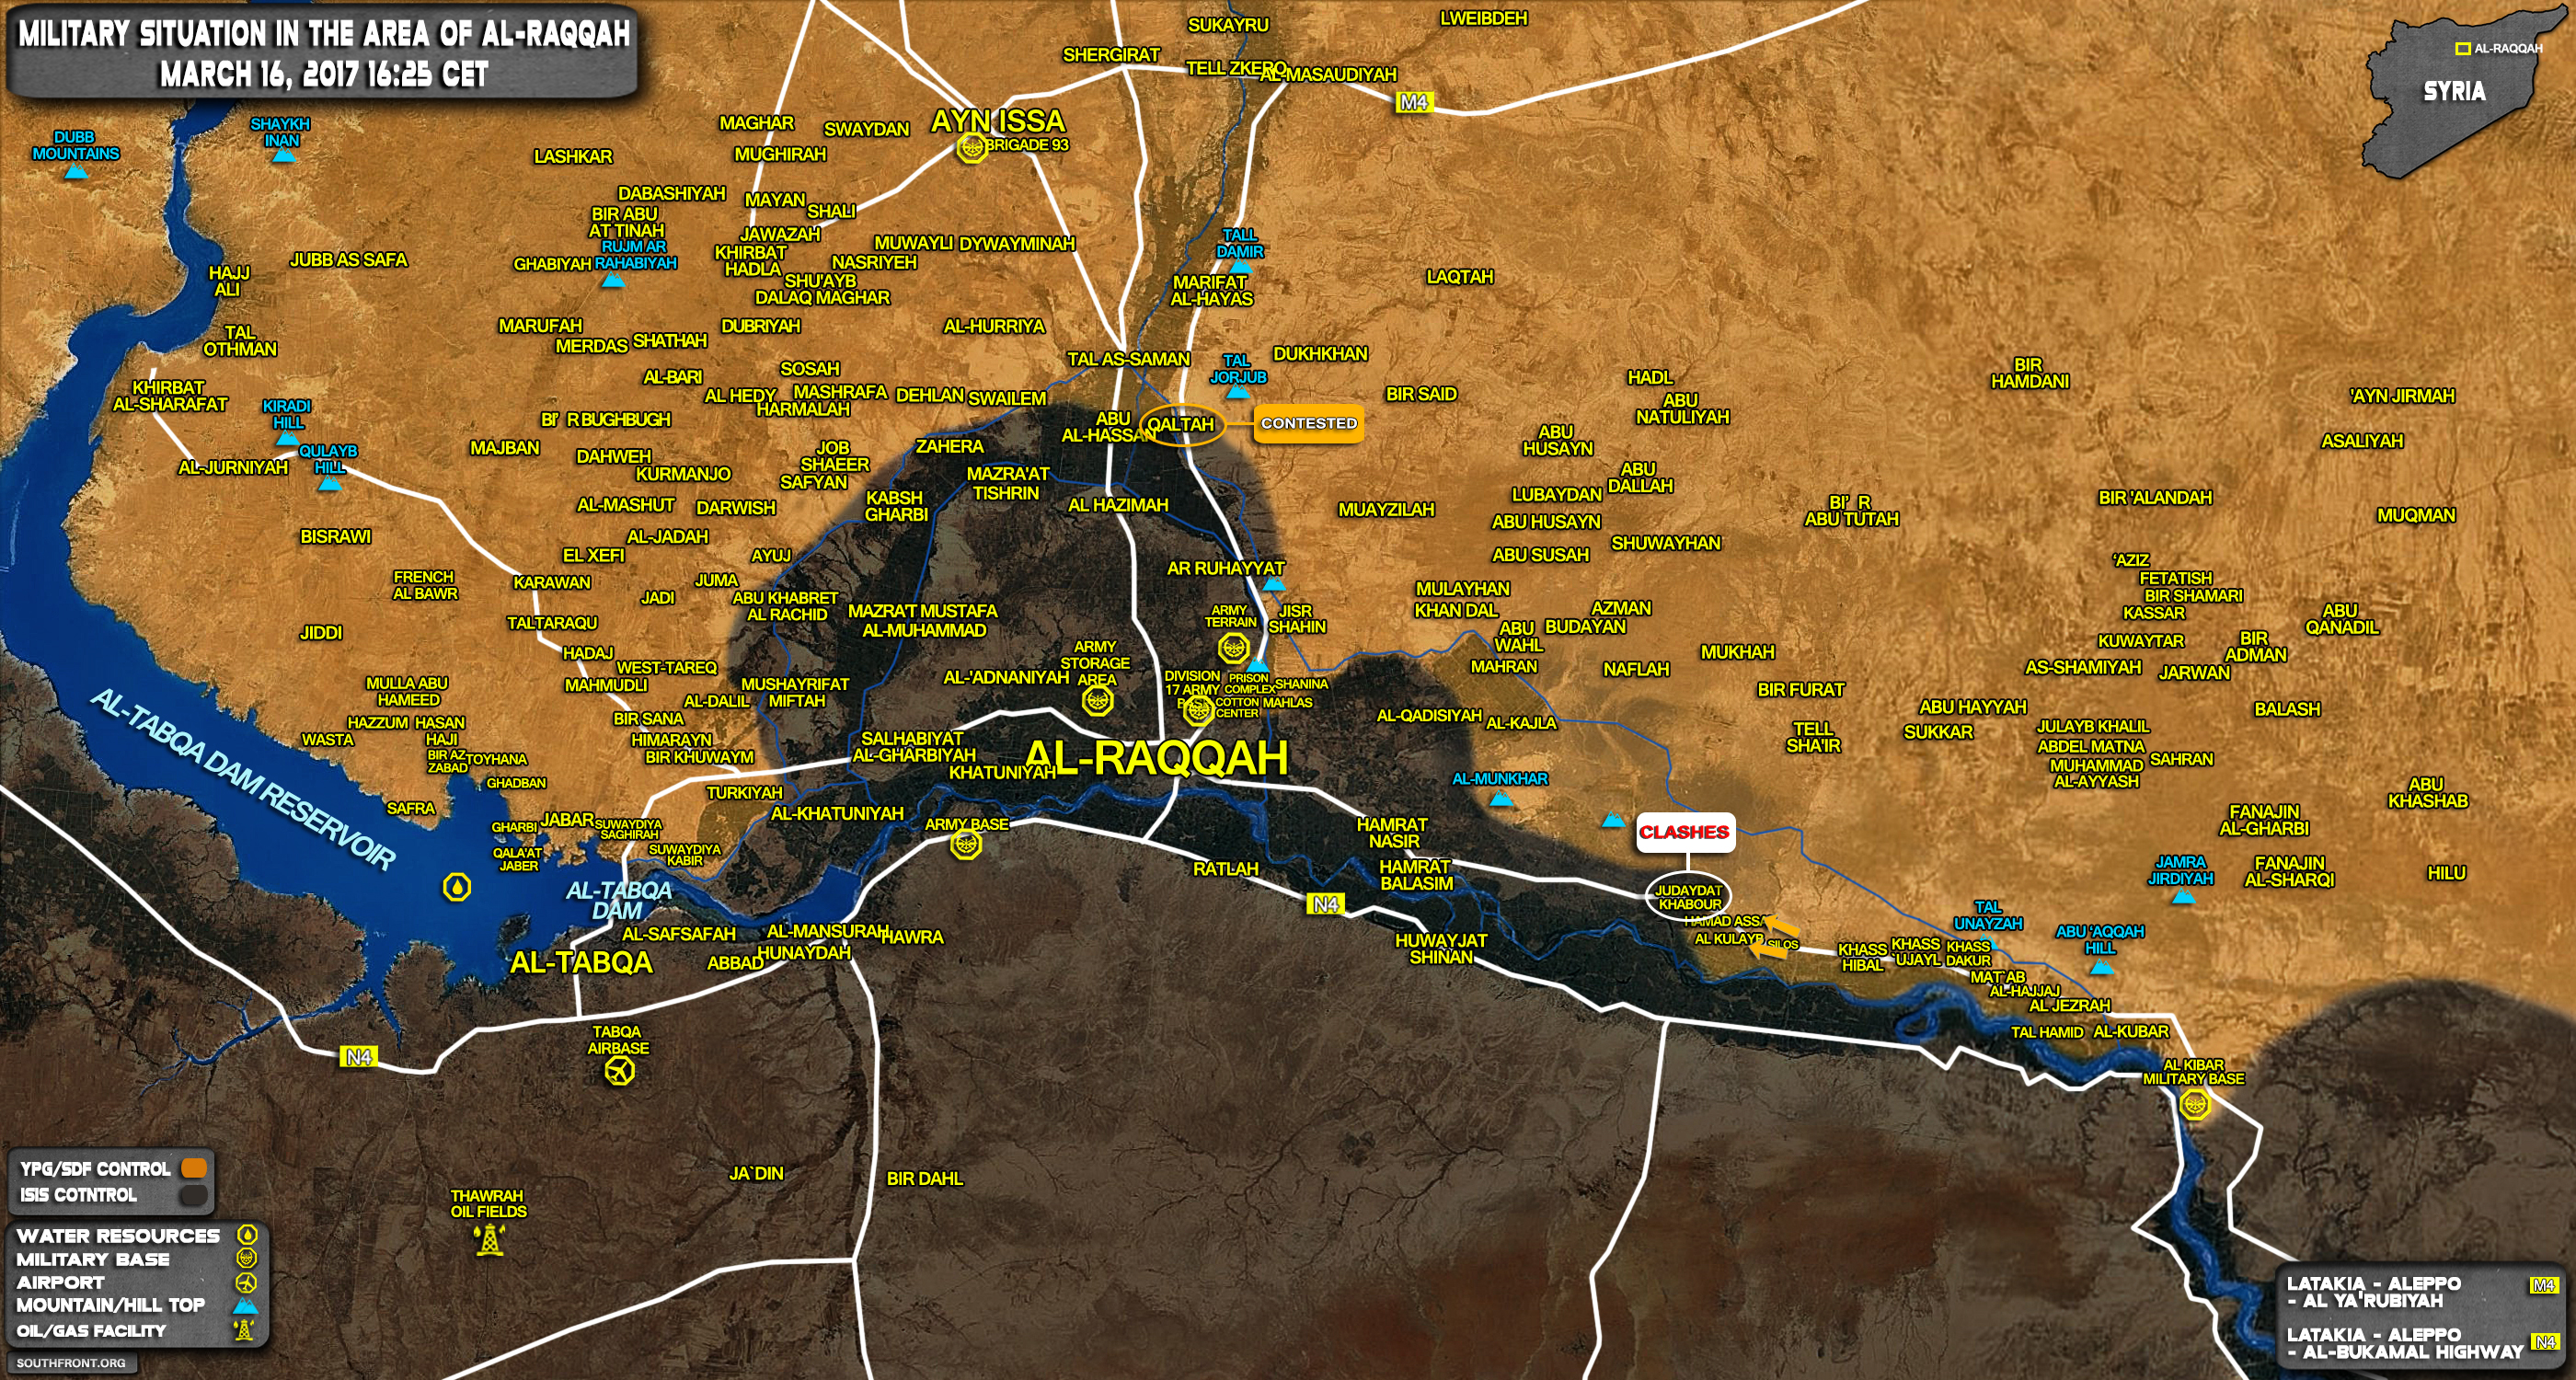 16m_Al-Raqqah_Syria_War_Map.jpg